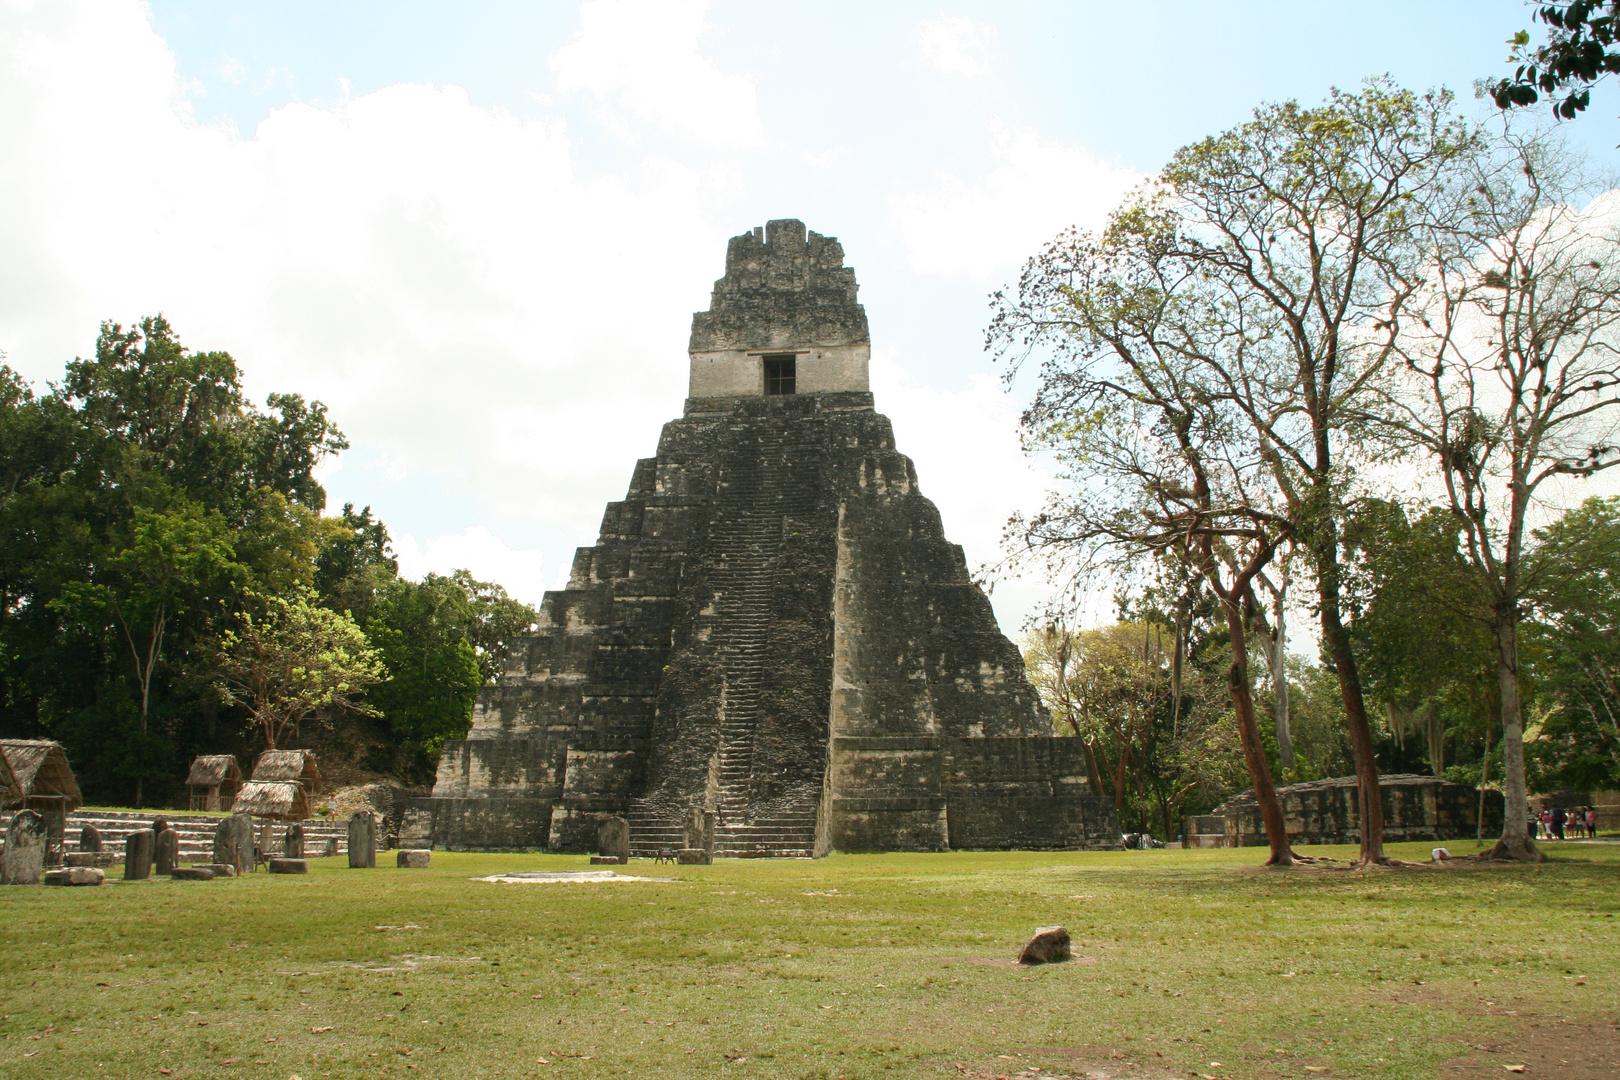 Mayapyramide in Guatemala